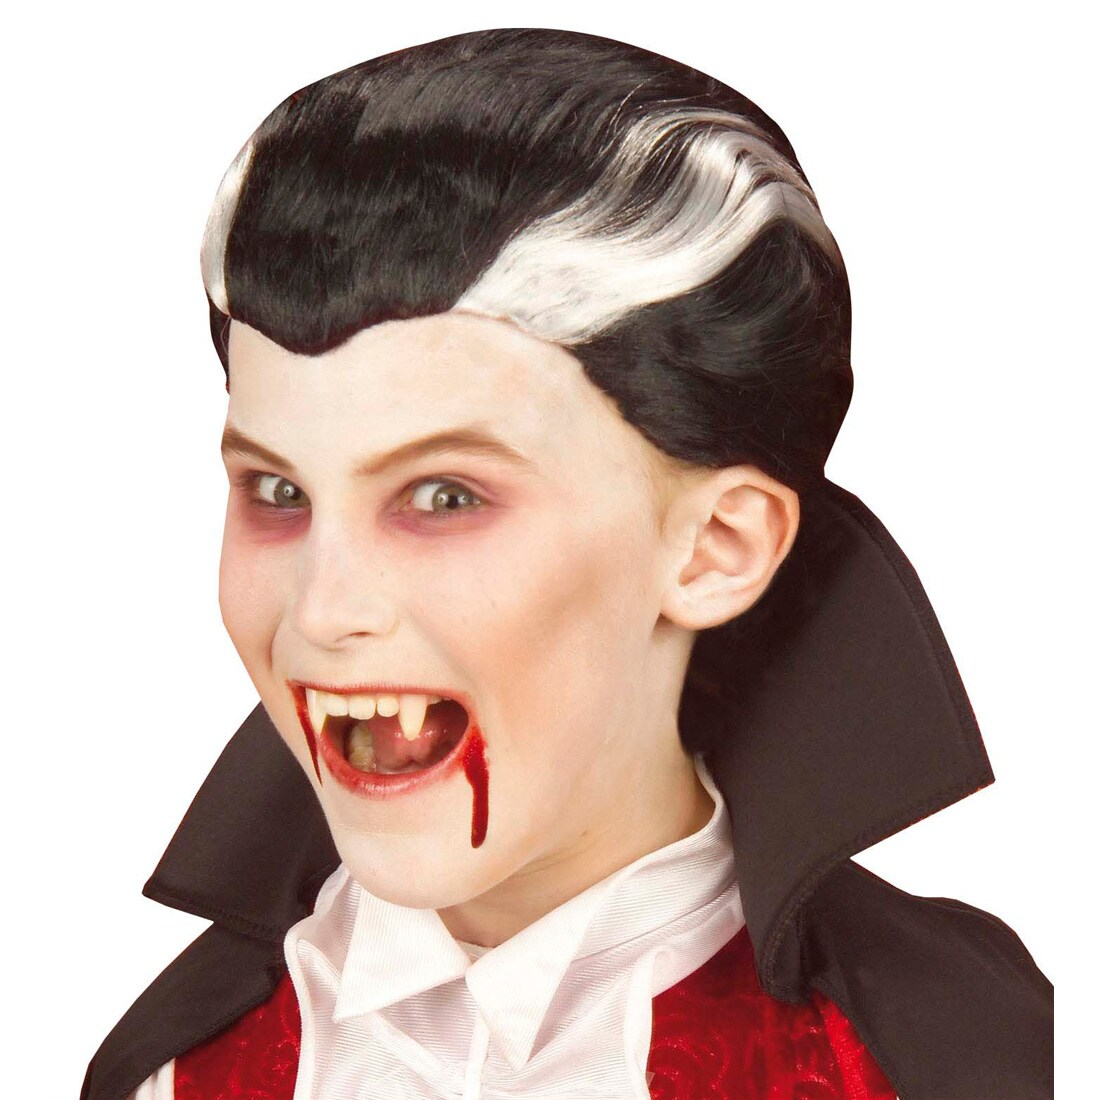 kinder per cke dracula halloween vampir per cken 10 99. Black Bedroom Furniture Sets. Home Design Ideas